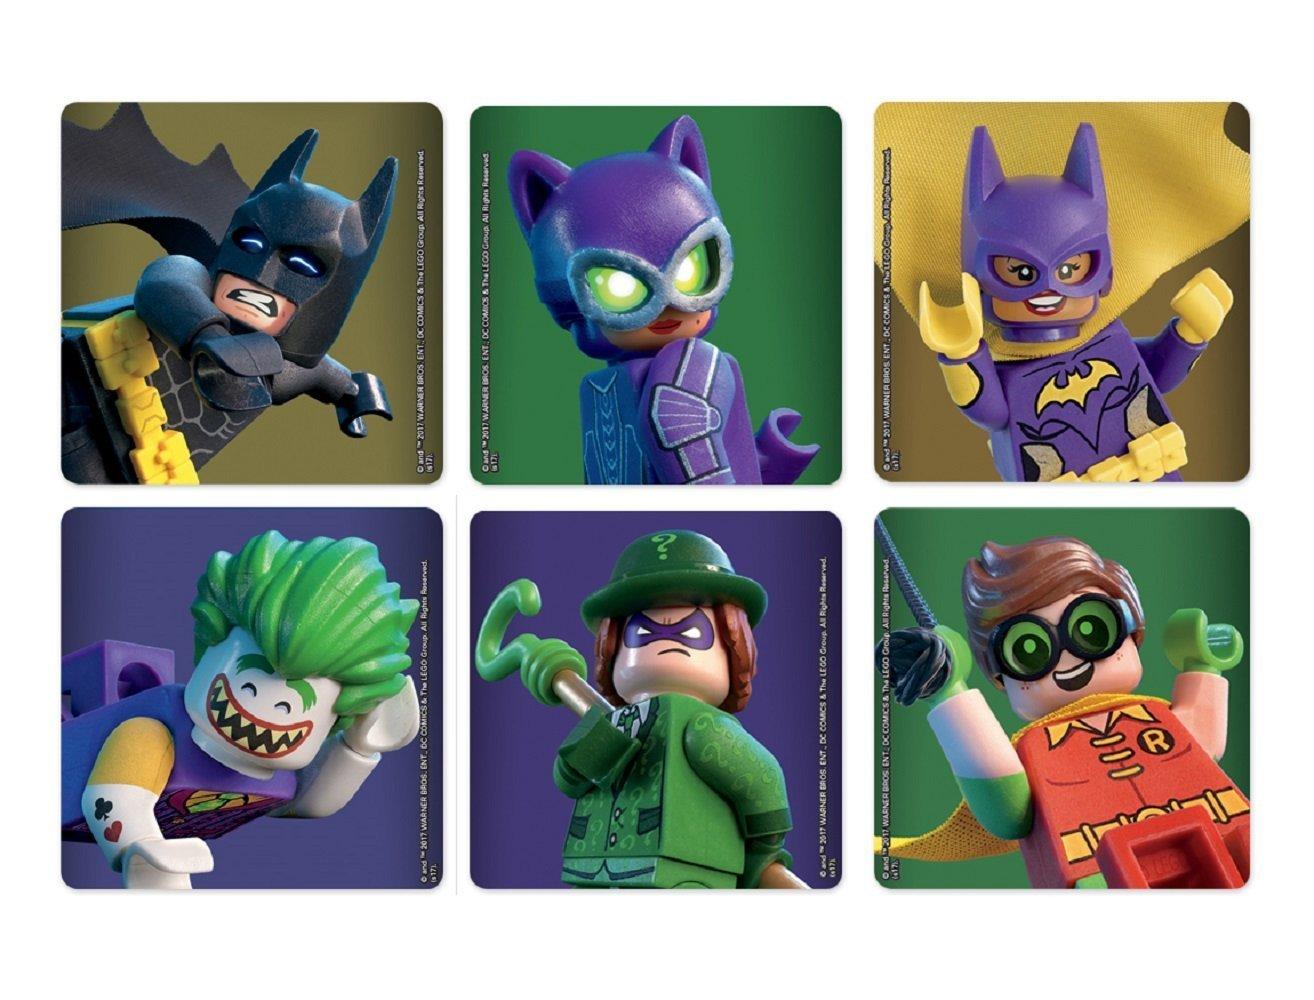 Lego Batman Movie Stickers - Roll of 100 by LS